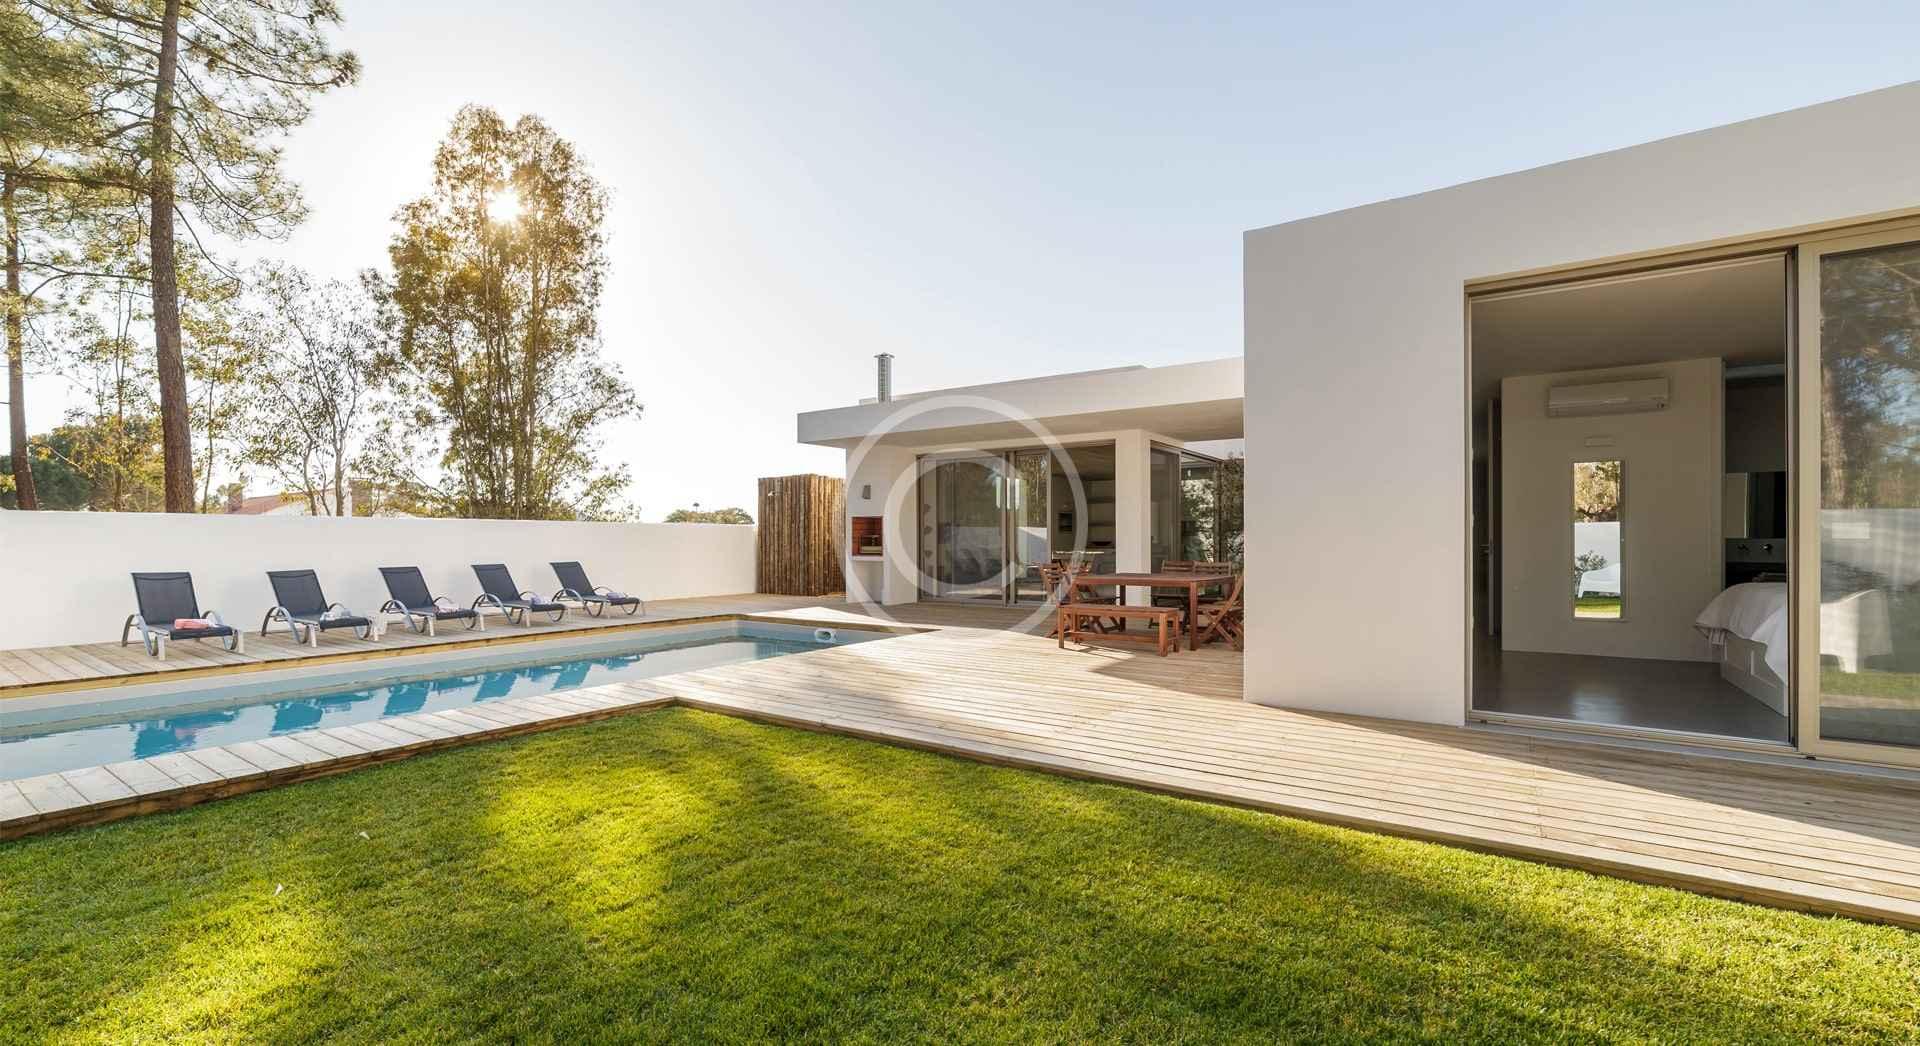 Landscape & Pool Solutions